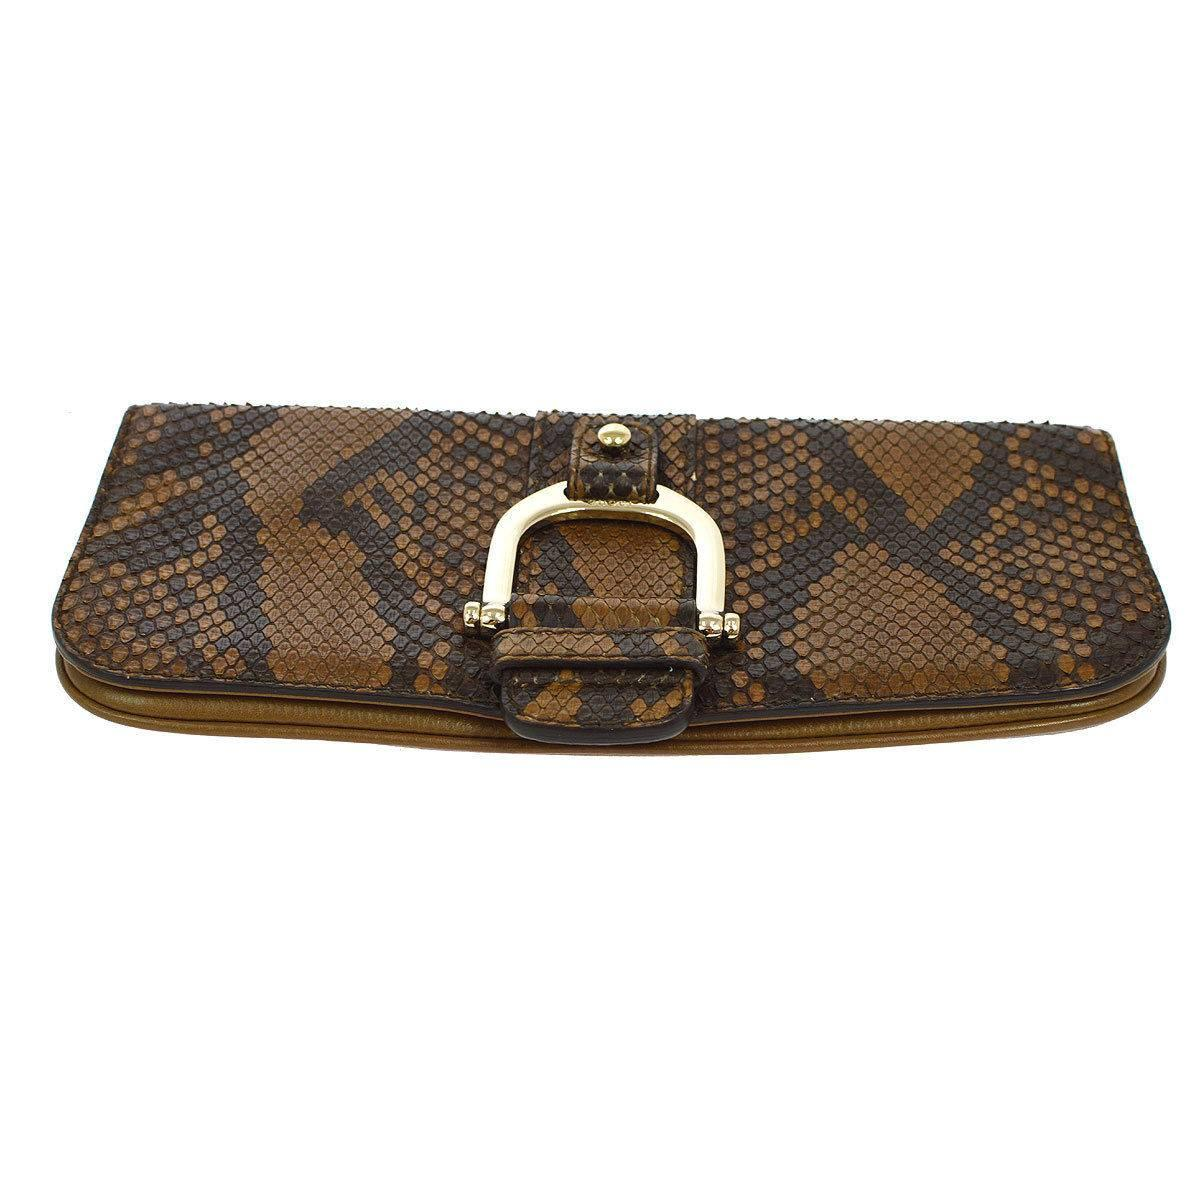 Gucci Cognac Taupe Black Snakeskin Leather Horsebit Evening Clutch Bag bYuycUQ